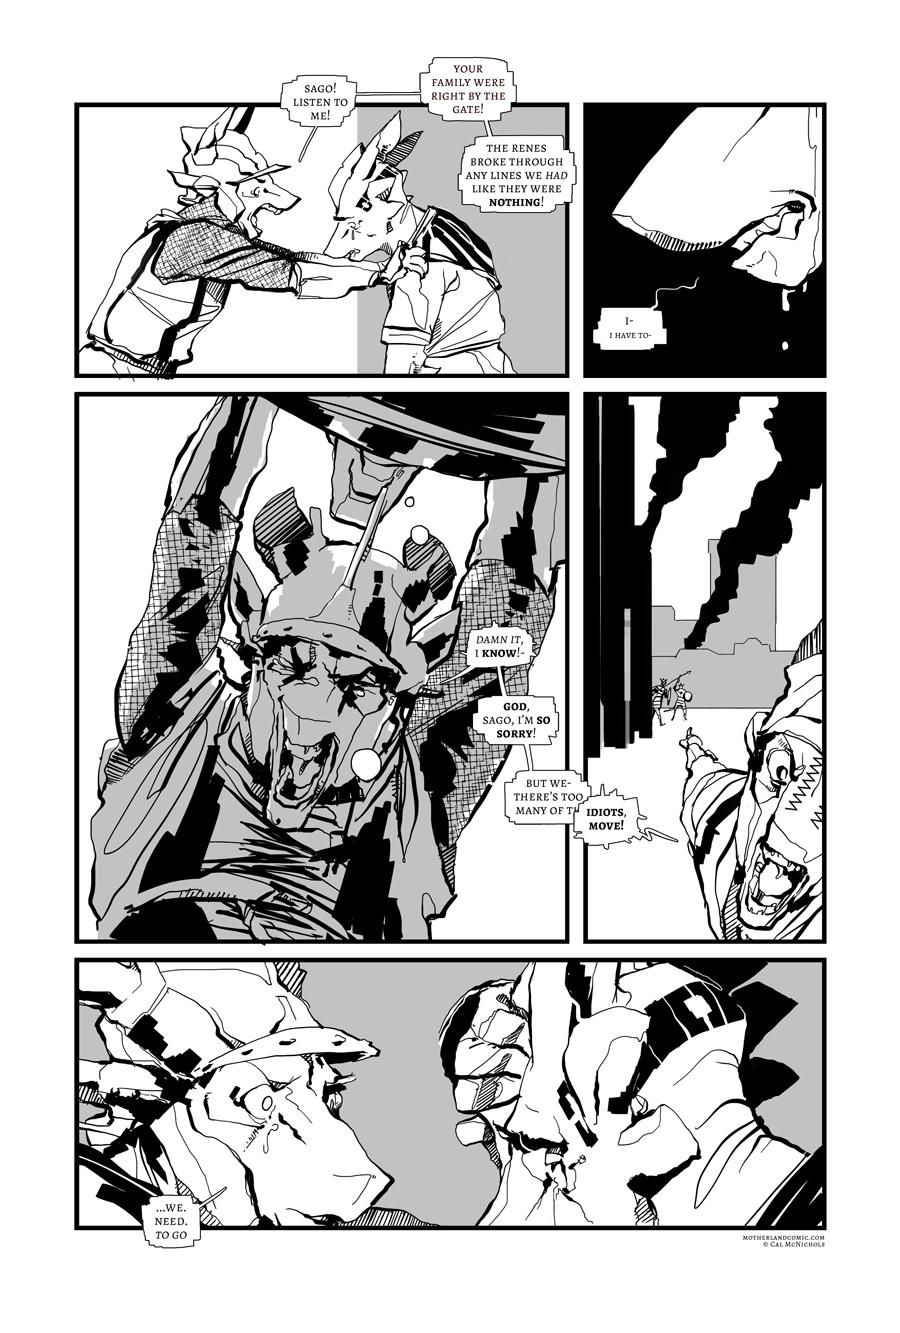 pg 37